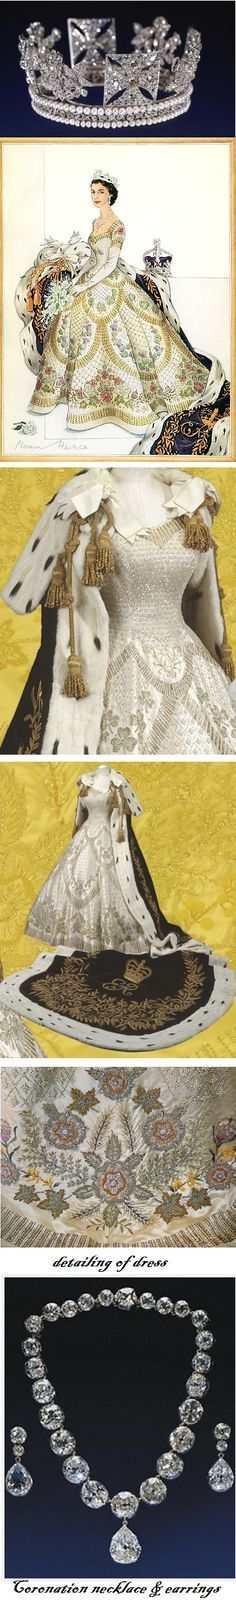 QUEEN ELIZABETH II |  Coronation gown, jewelry and crown.